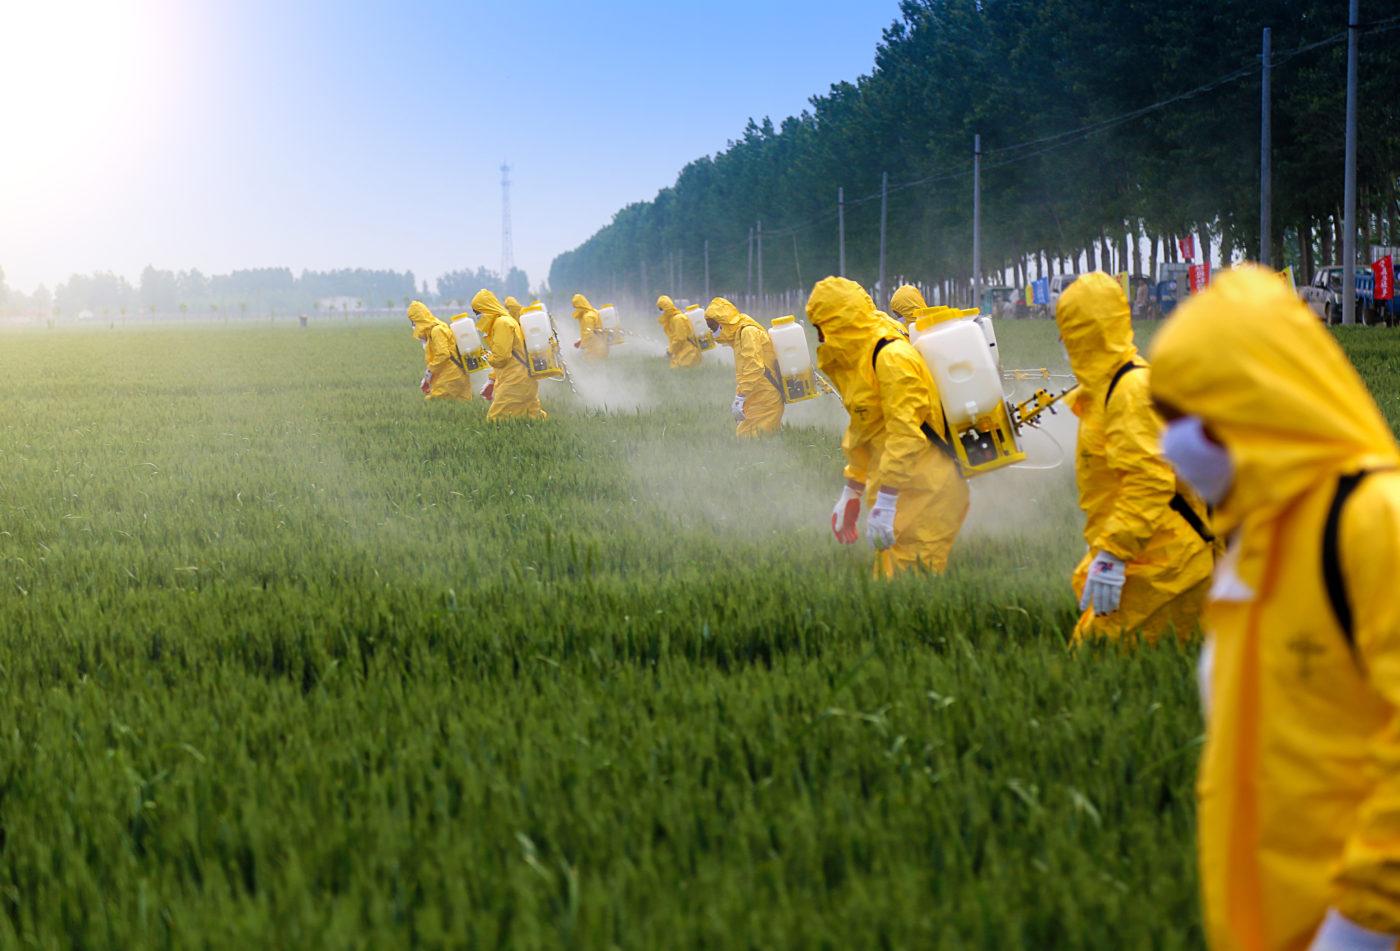 https://www.sosfaim.be/wp-content/uploads/2020/11/pesticides-1400x951.jpg